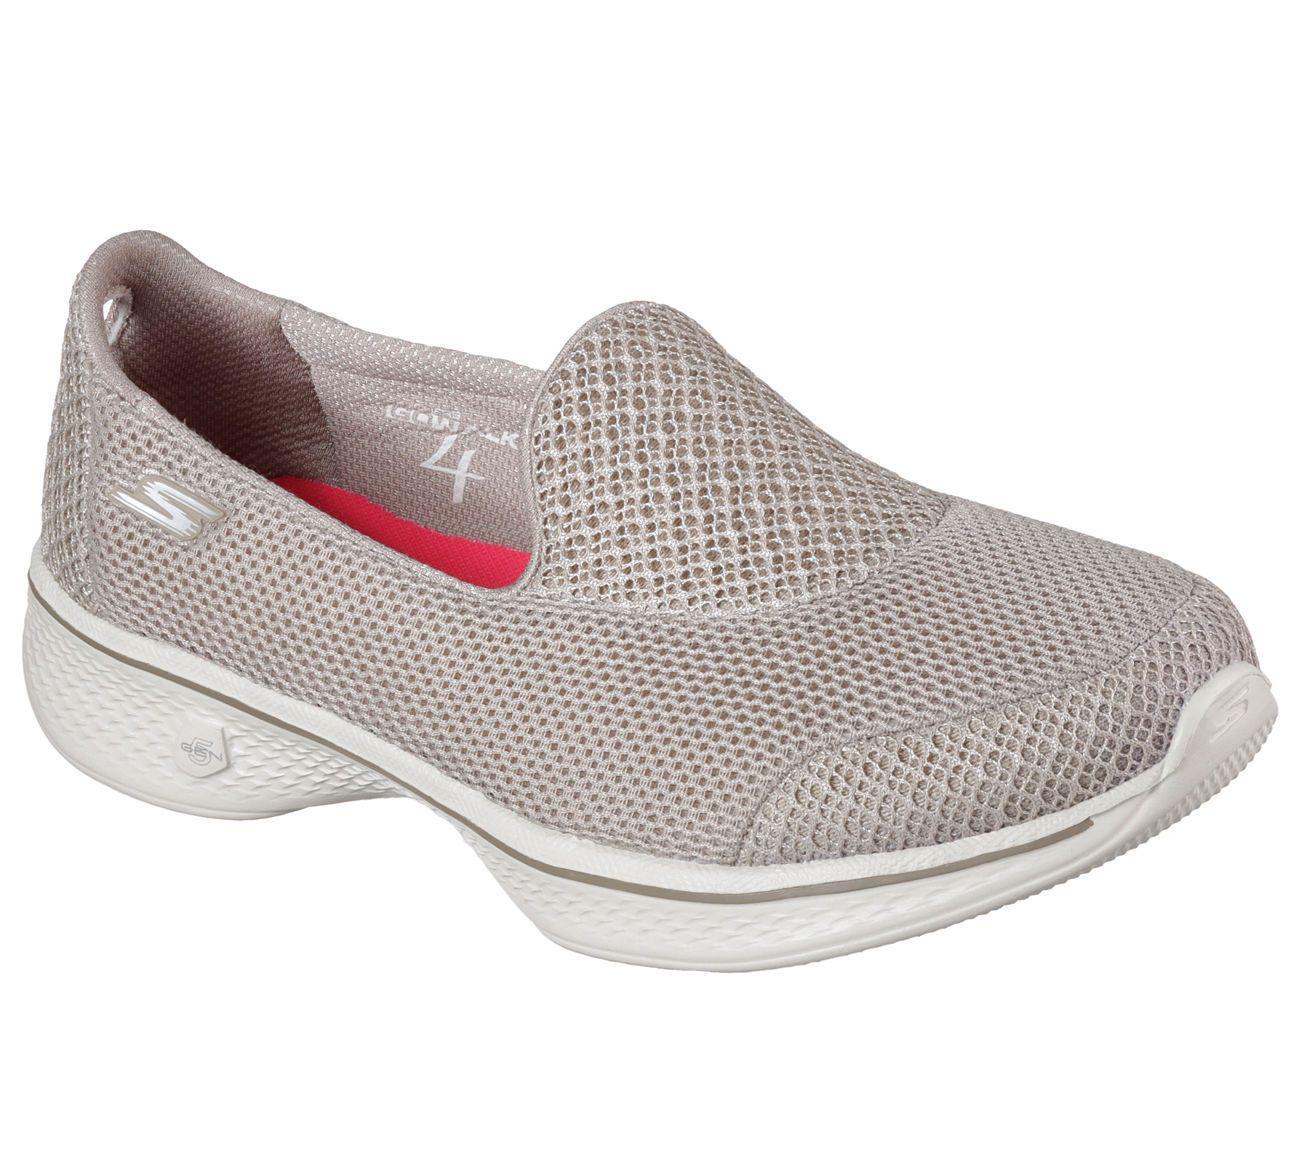 Skechers Women's Shoes Go Walk Light Mesh Slip On Comfort Casual